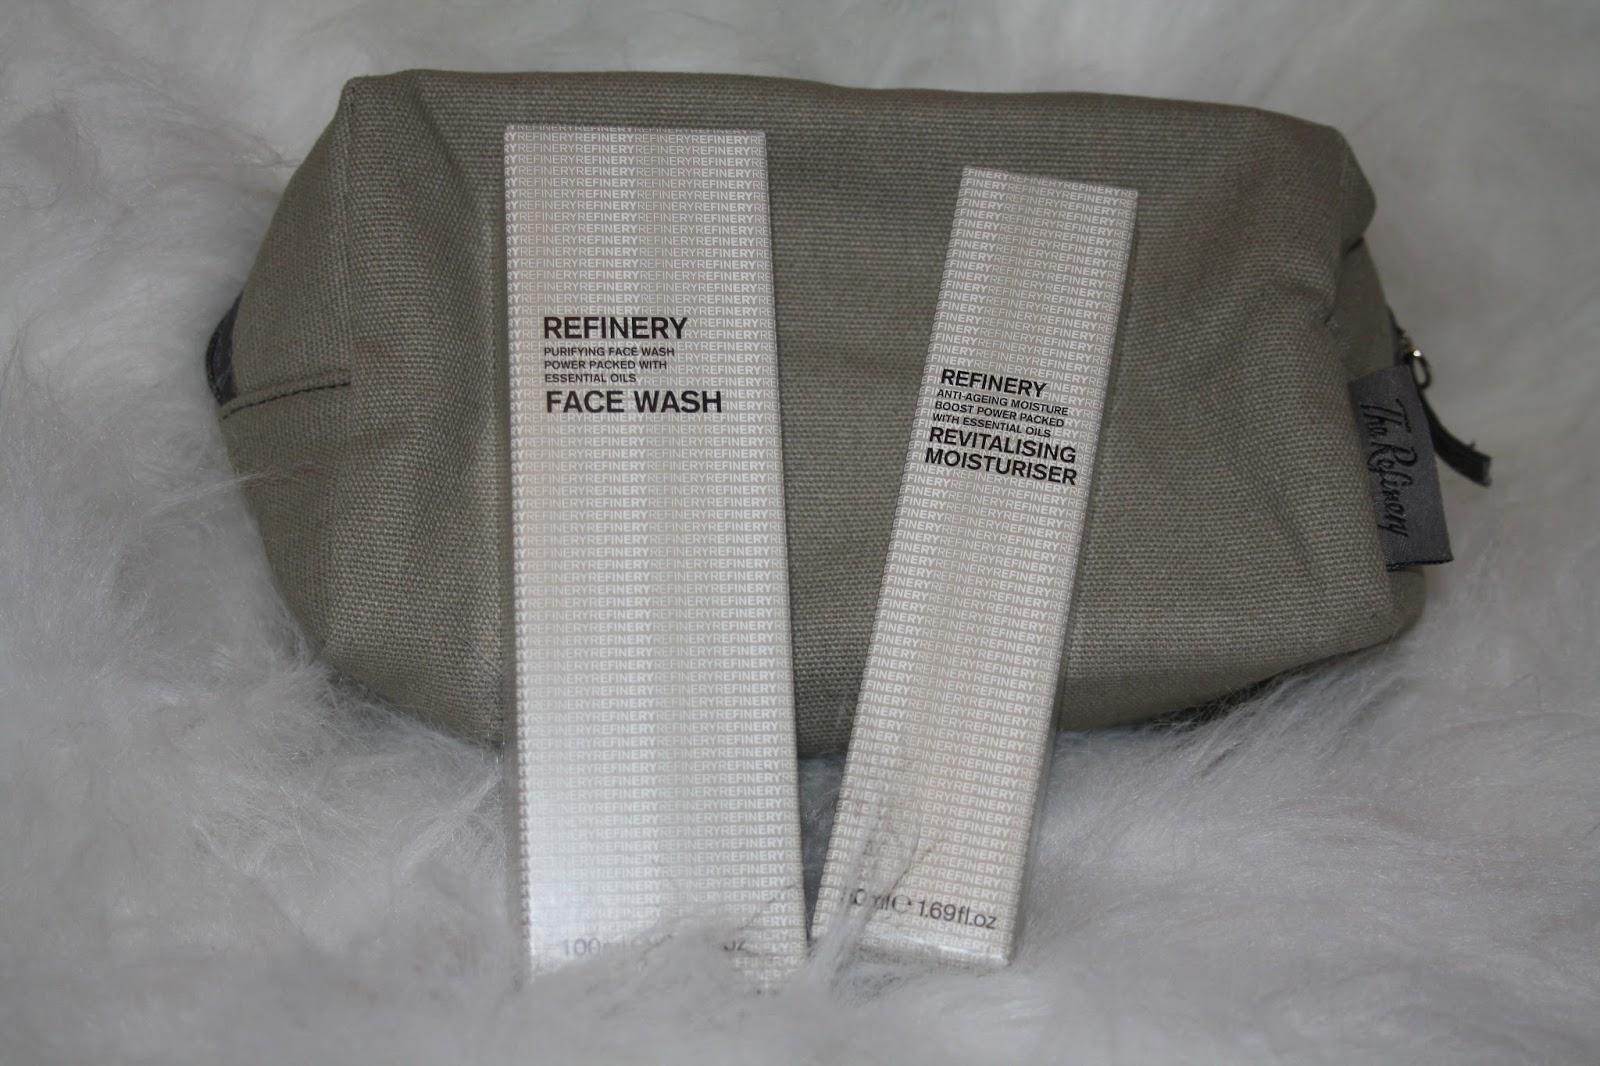 Beautykinguk: Christmas Gift Ideas for Him #3 - Aromatherapy ...